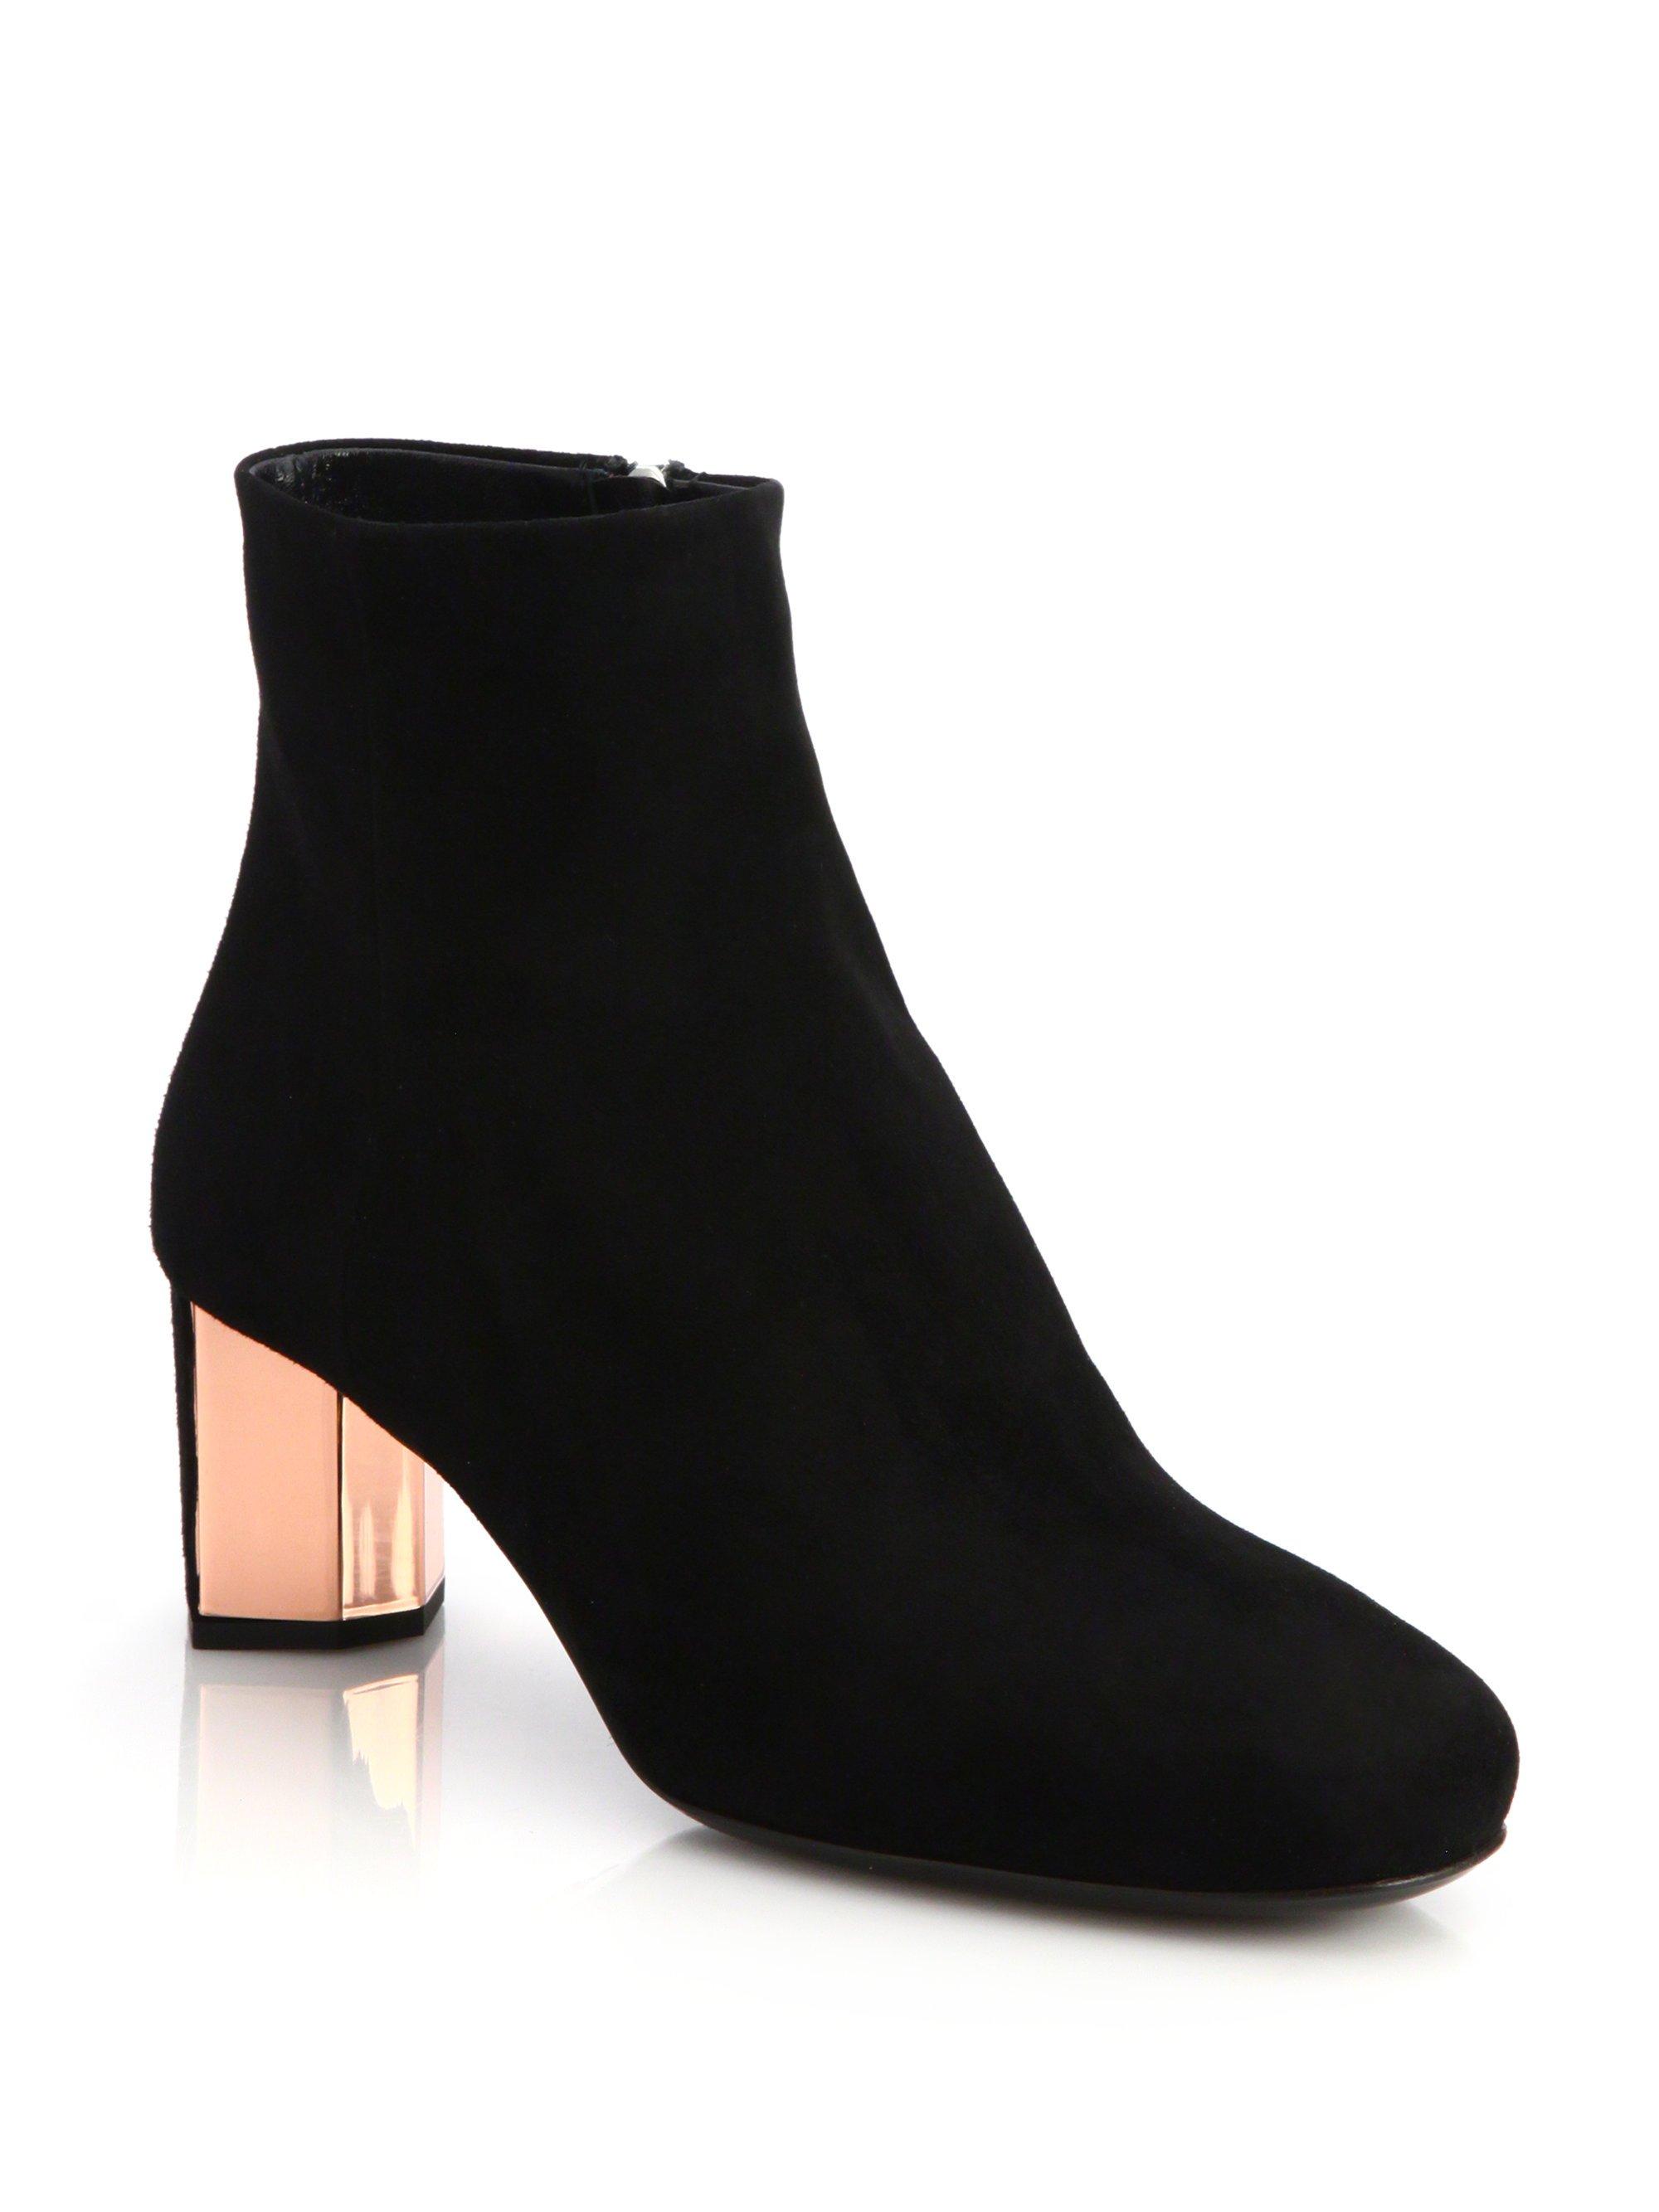 d5efef6d1c1e Lyst - Prada Suede Metal-heel Ankle Boots in Black